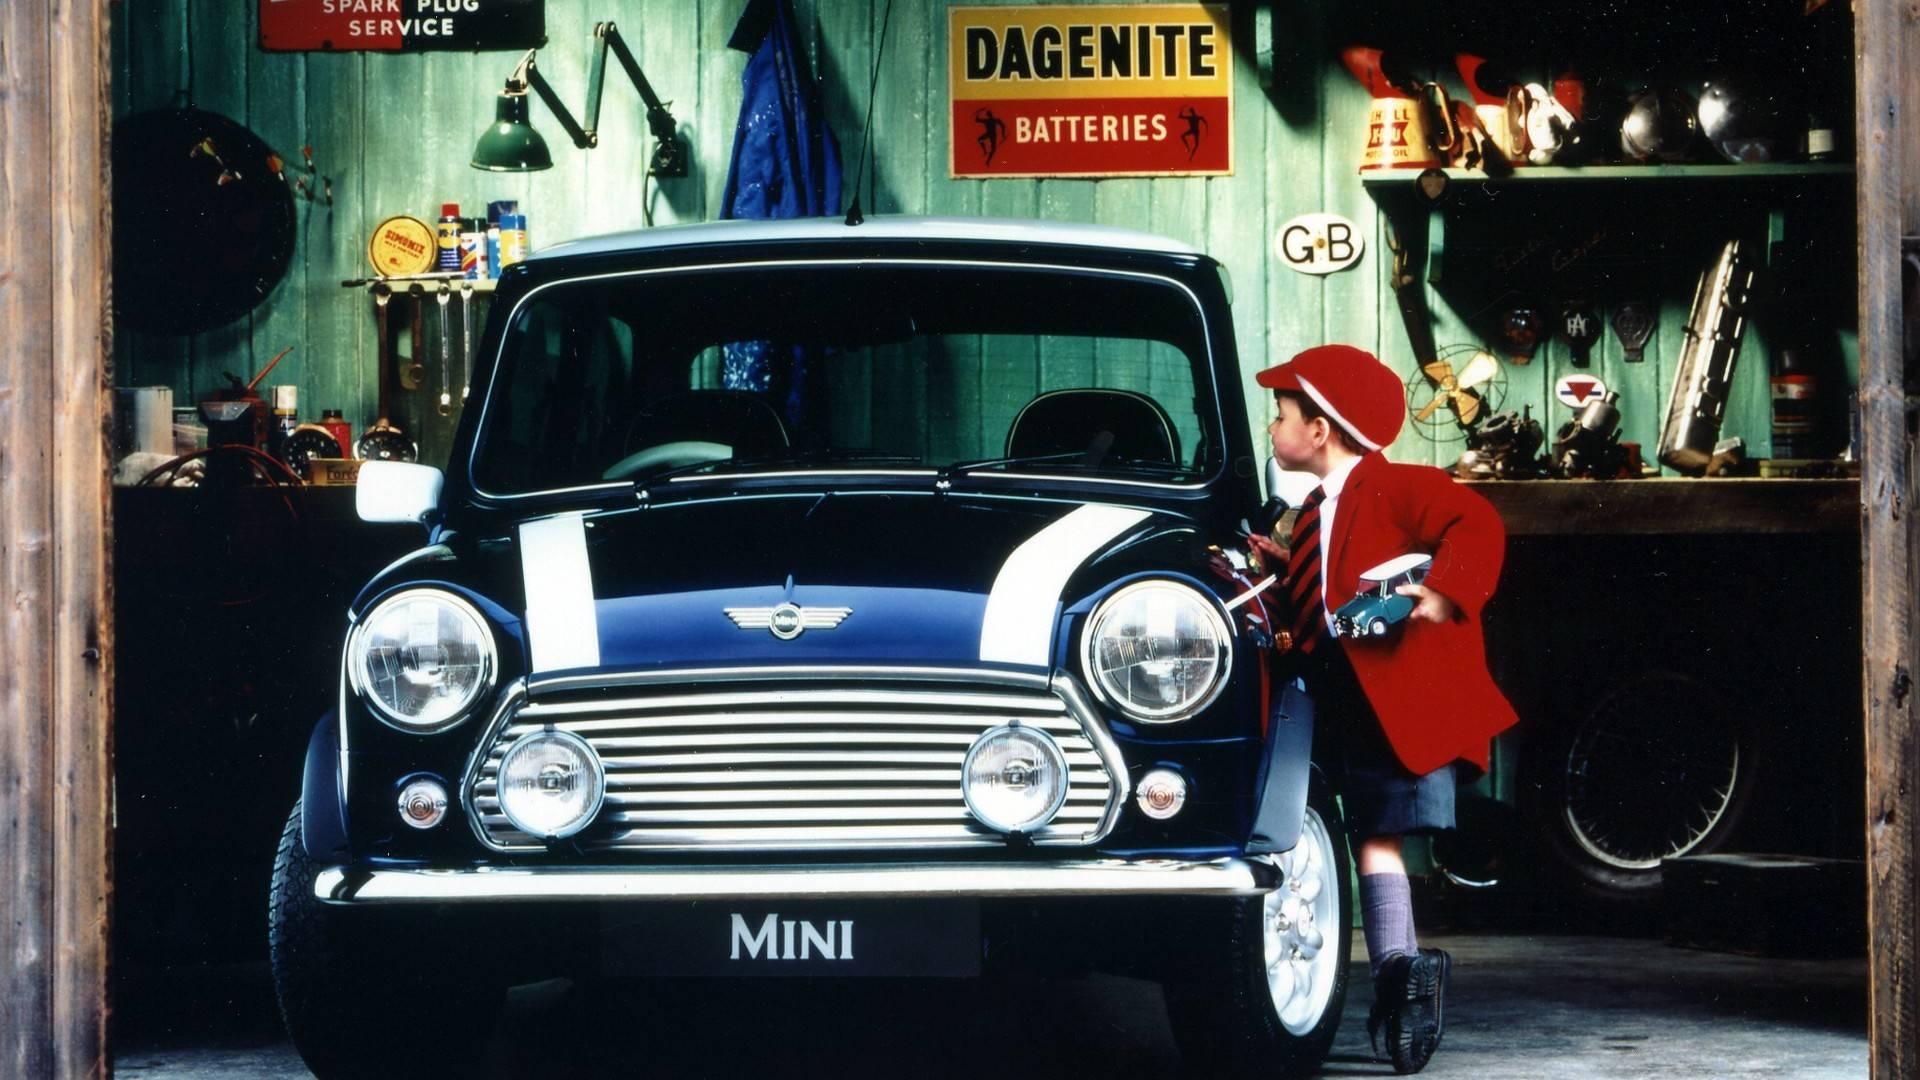 5a9414cd925c1 classic mini through the years چرا ما کلاسیک مینی را دوست داریم   اجاره ماشین